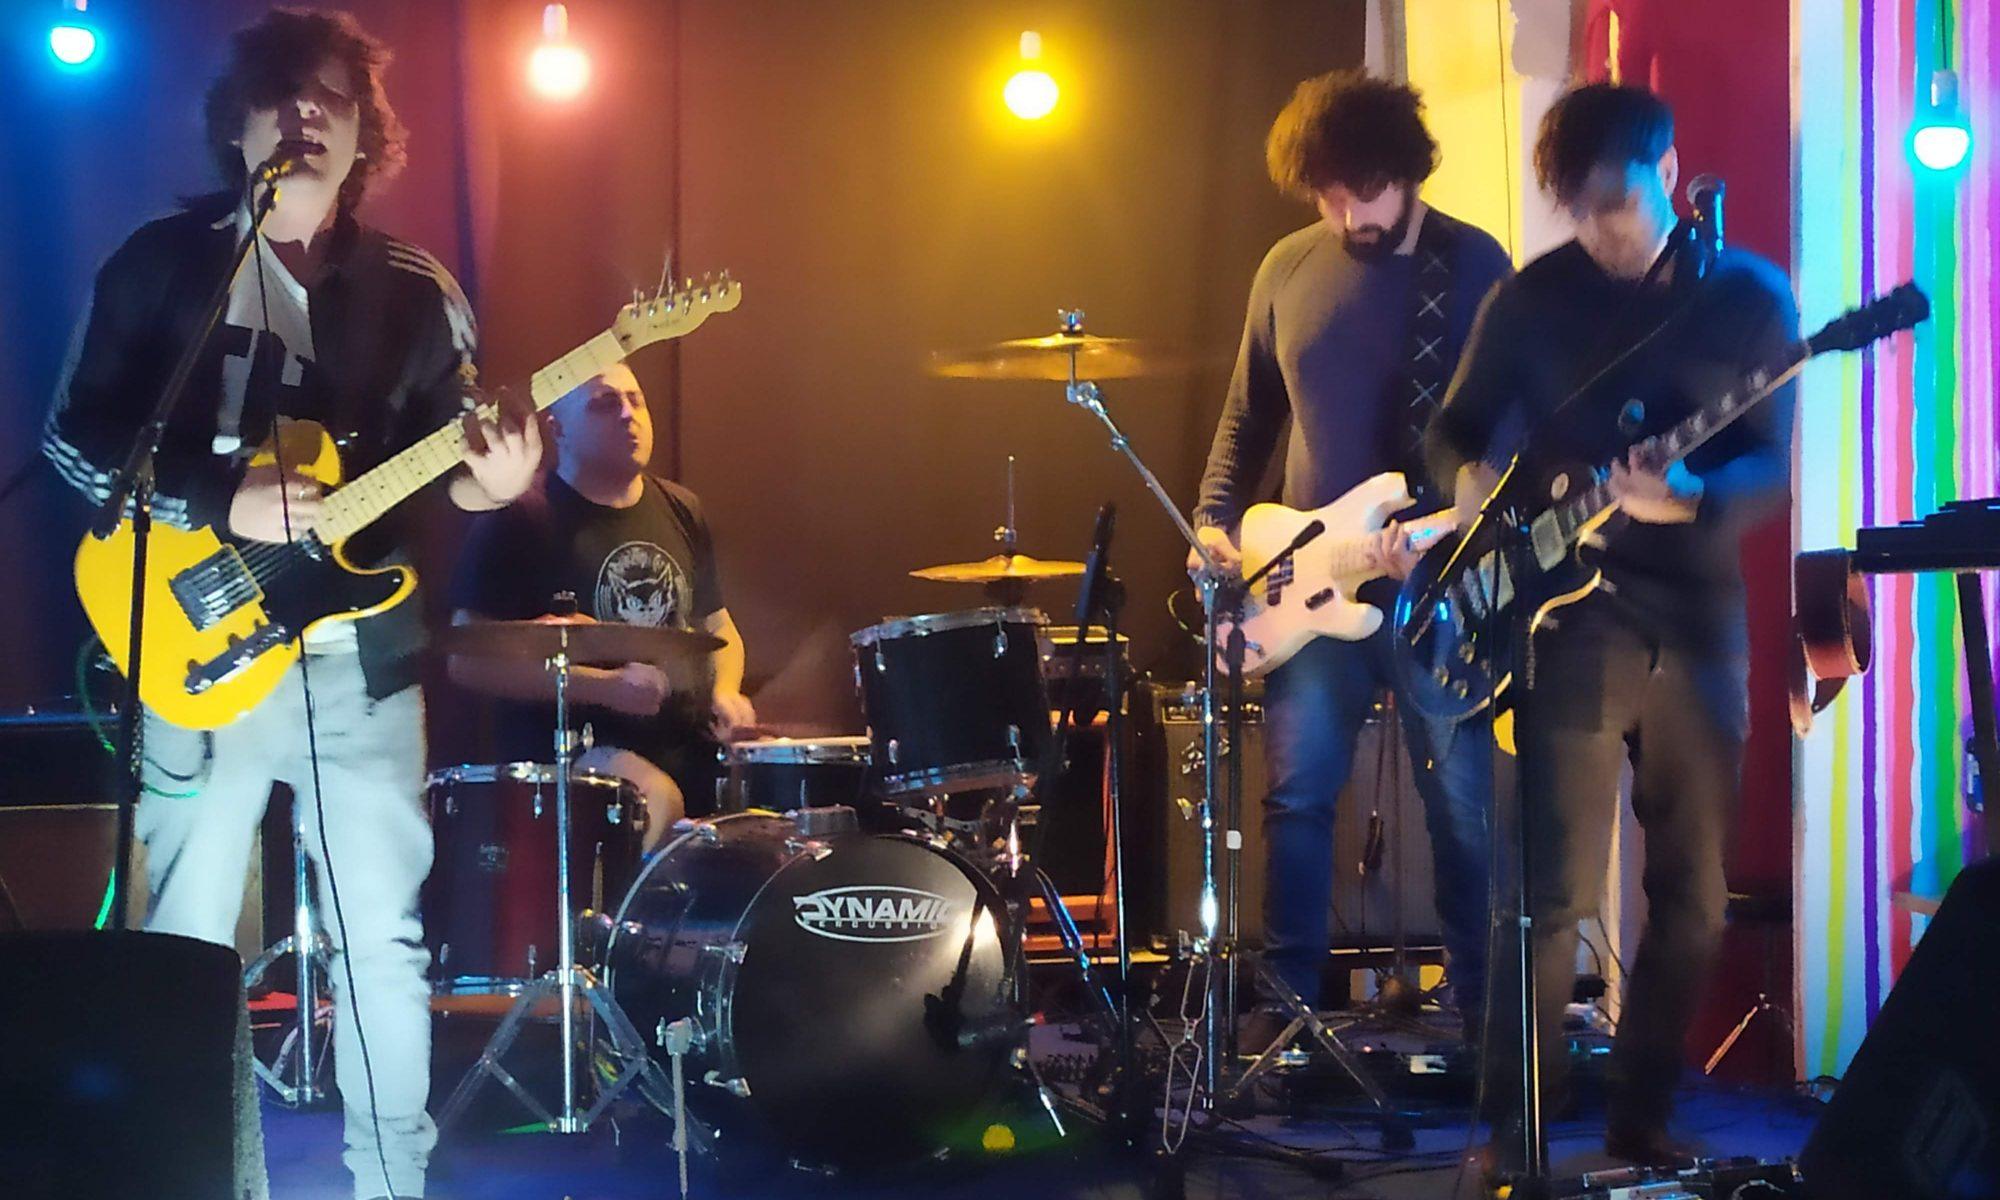 Doris_live_band